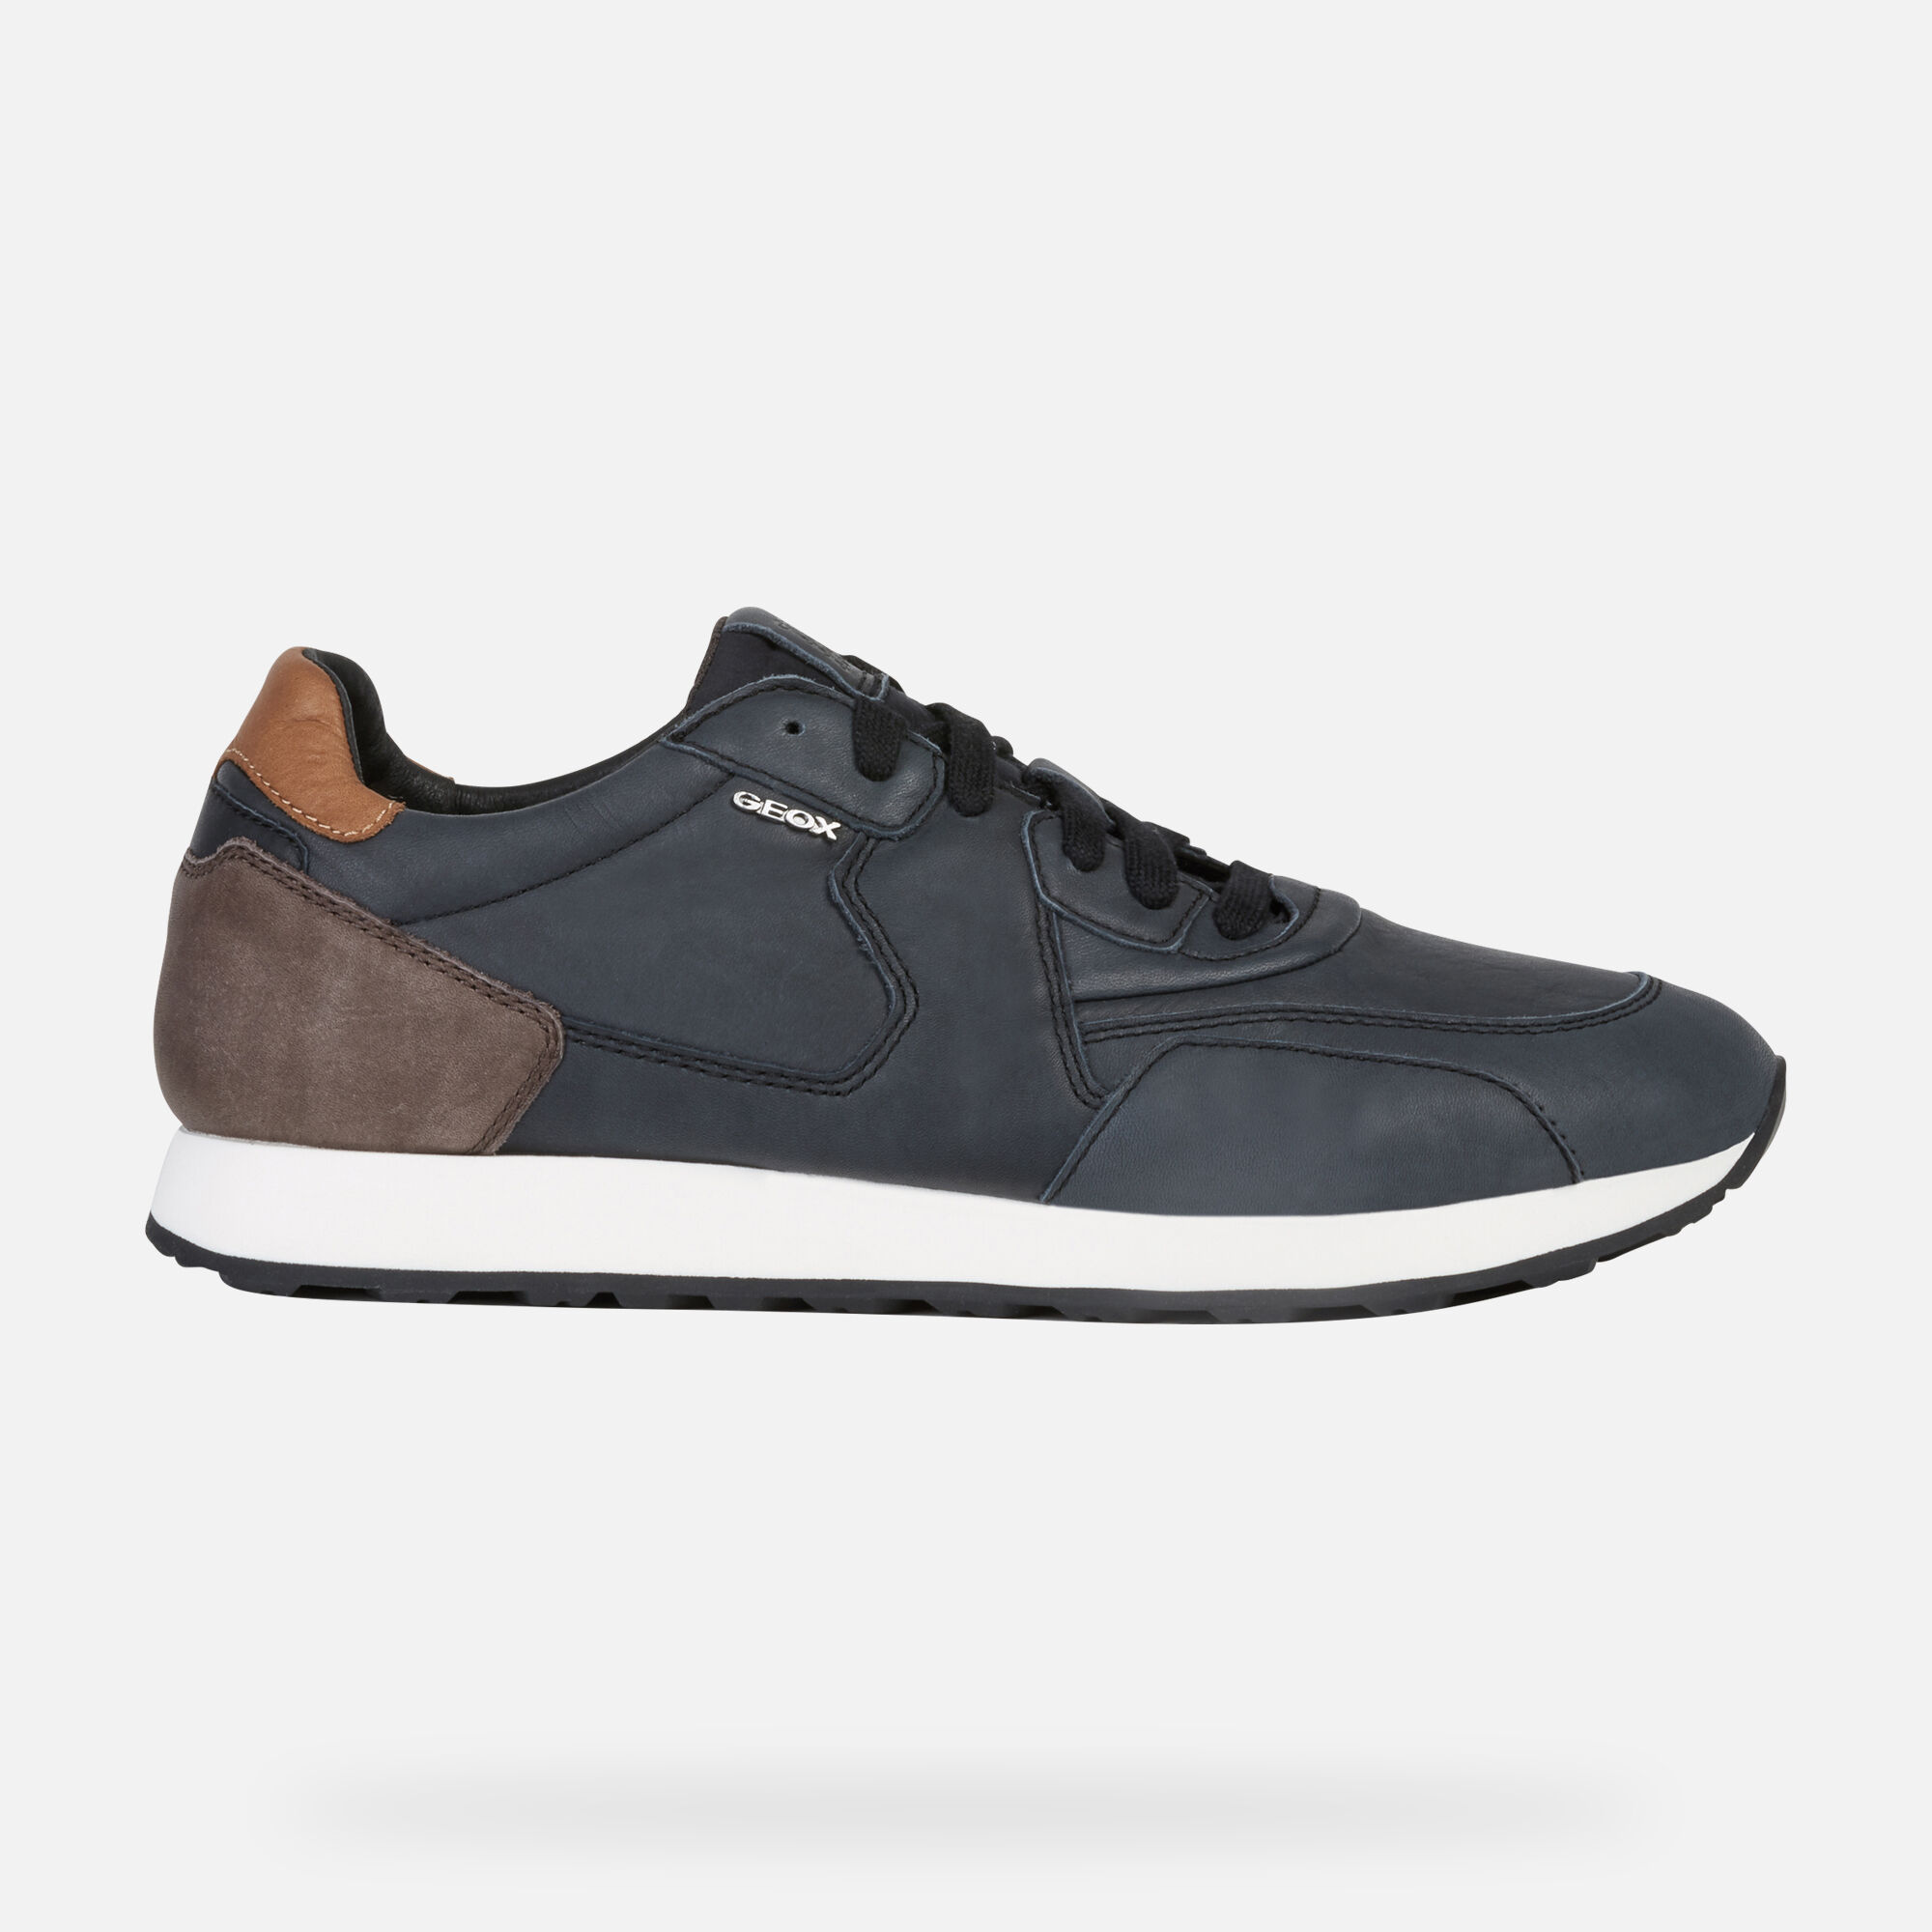 GEOX VINCIT Uomo: Sneakers Basse Nere | GEOX ® FW 1920 | Geox